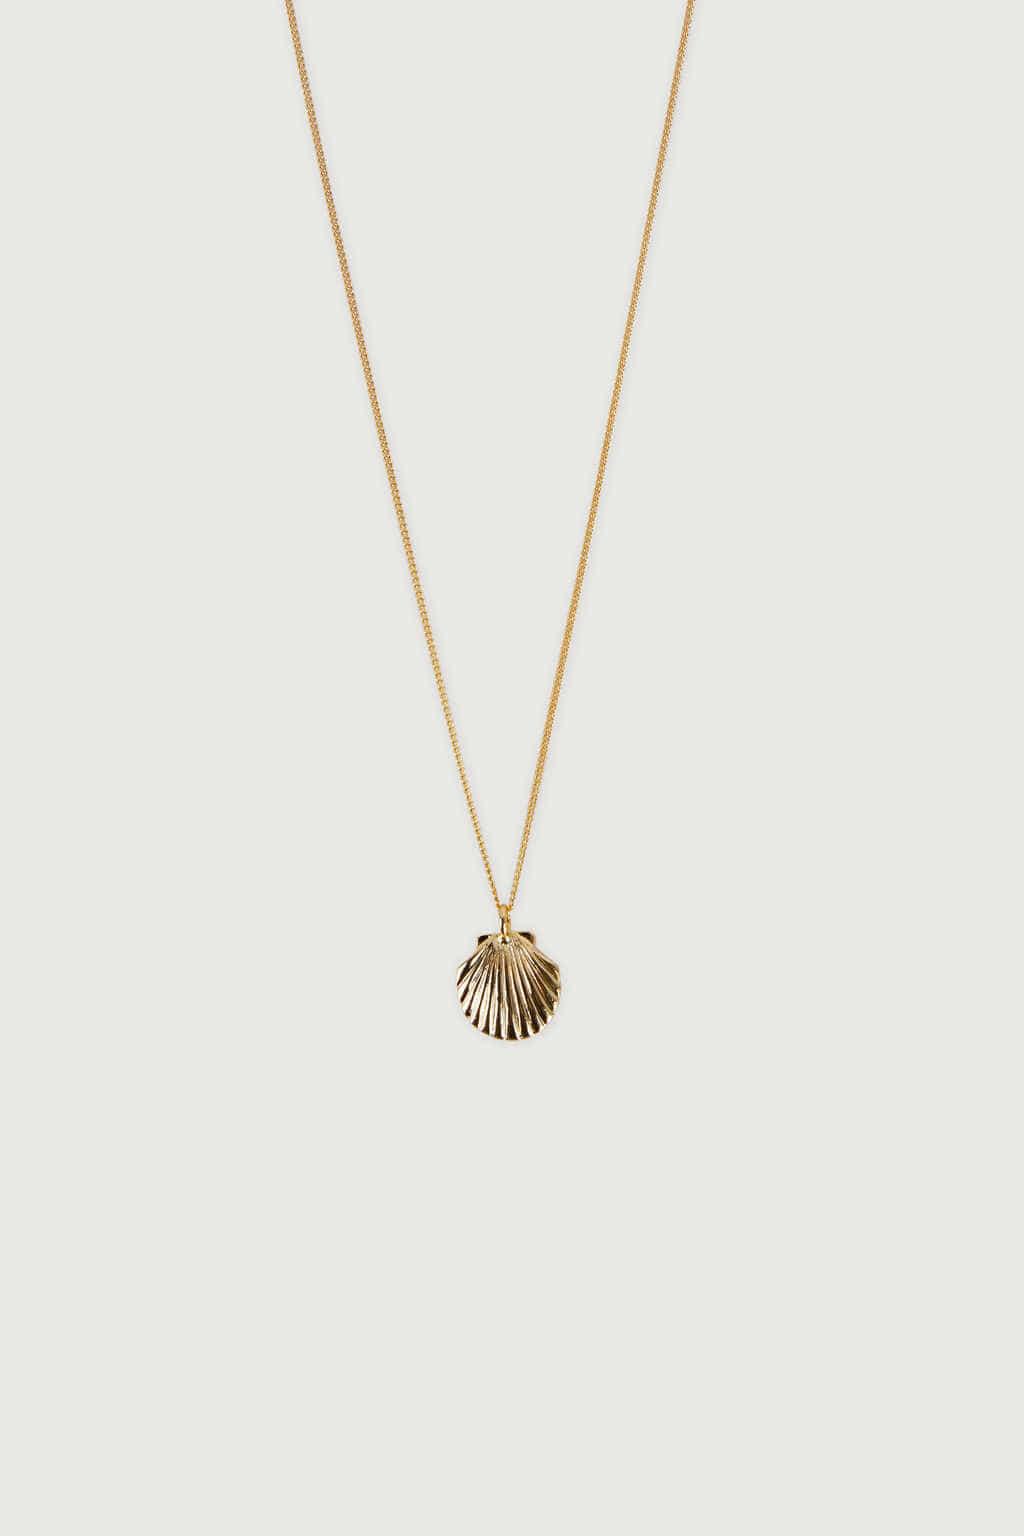 Necklace J008 Gold 1